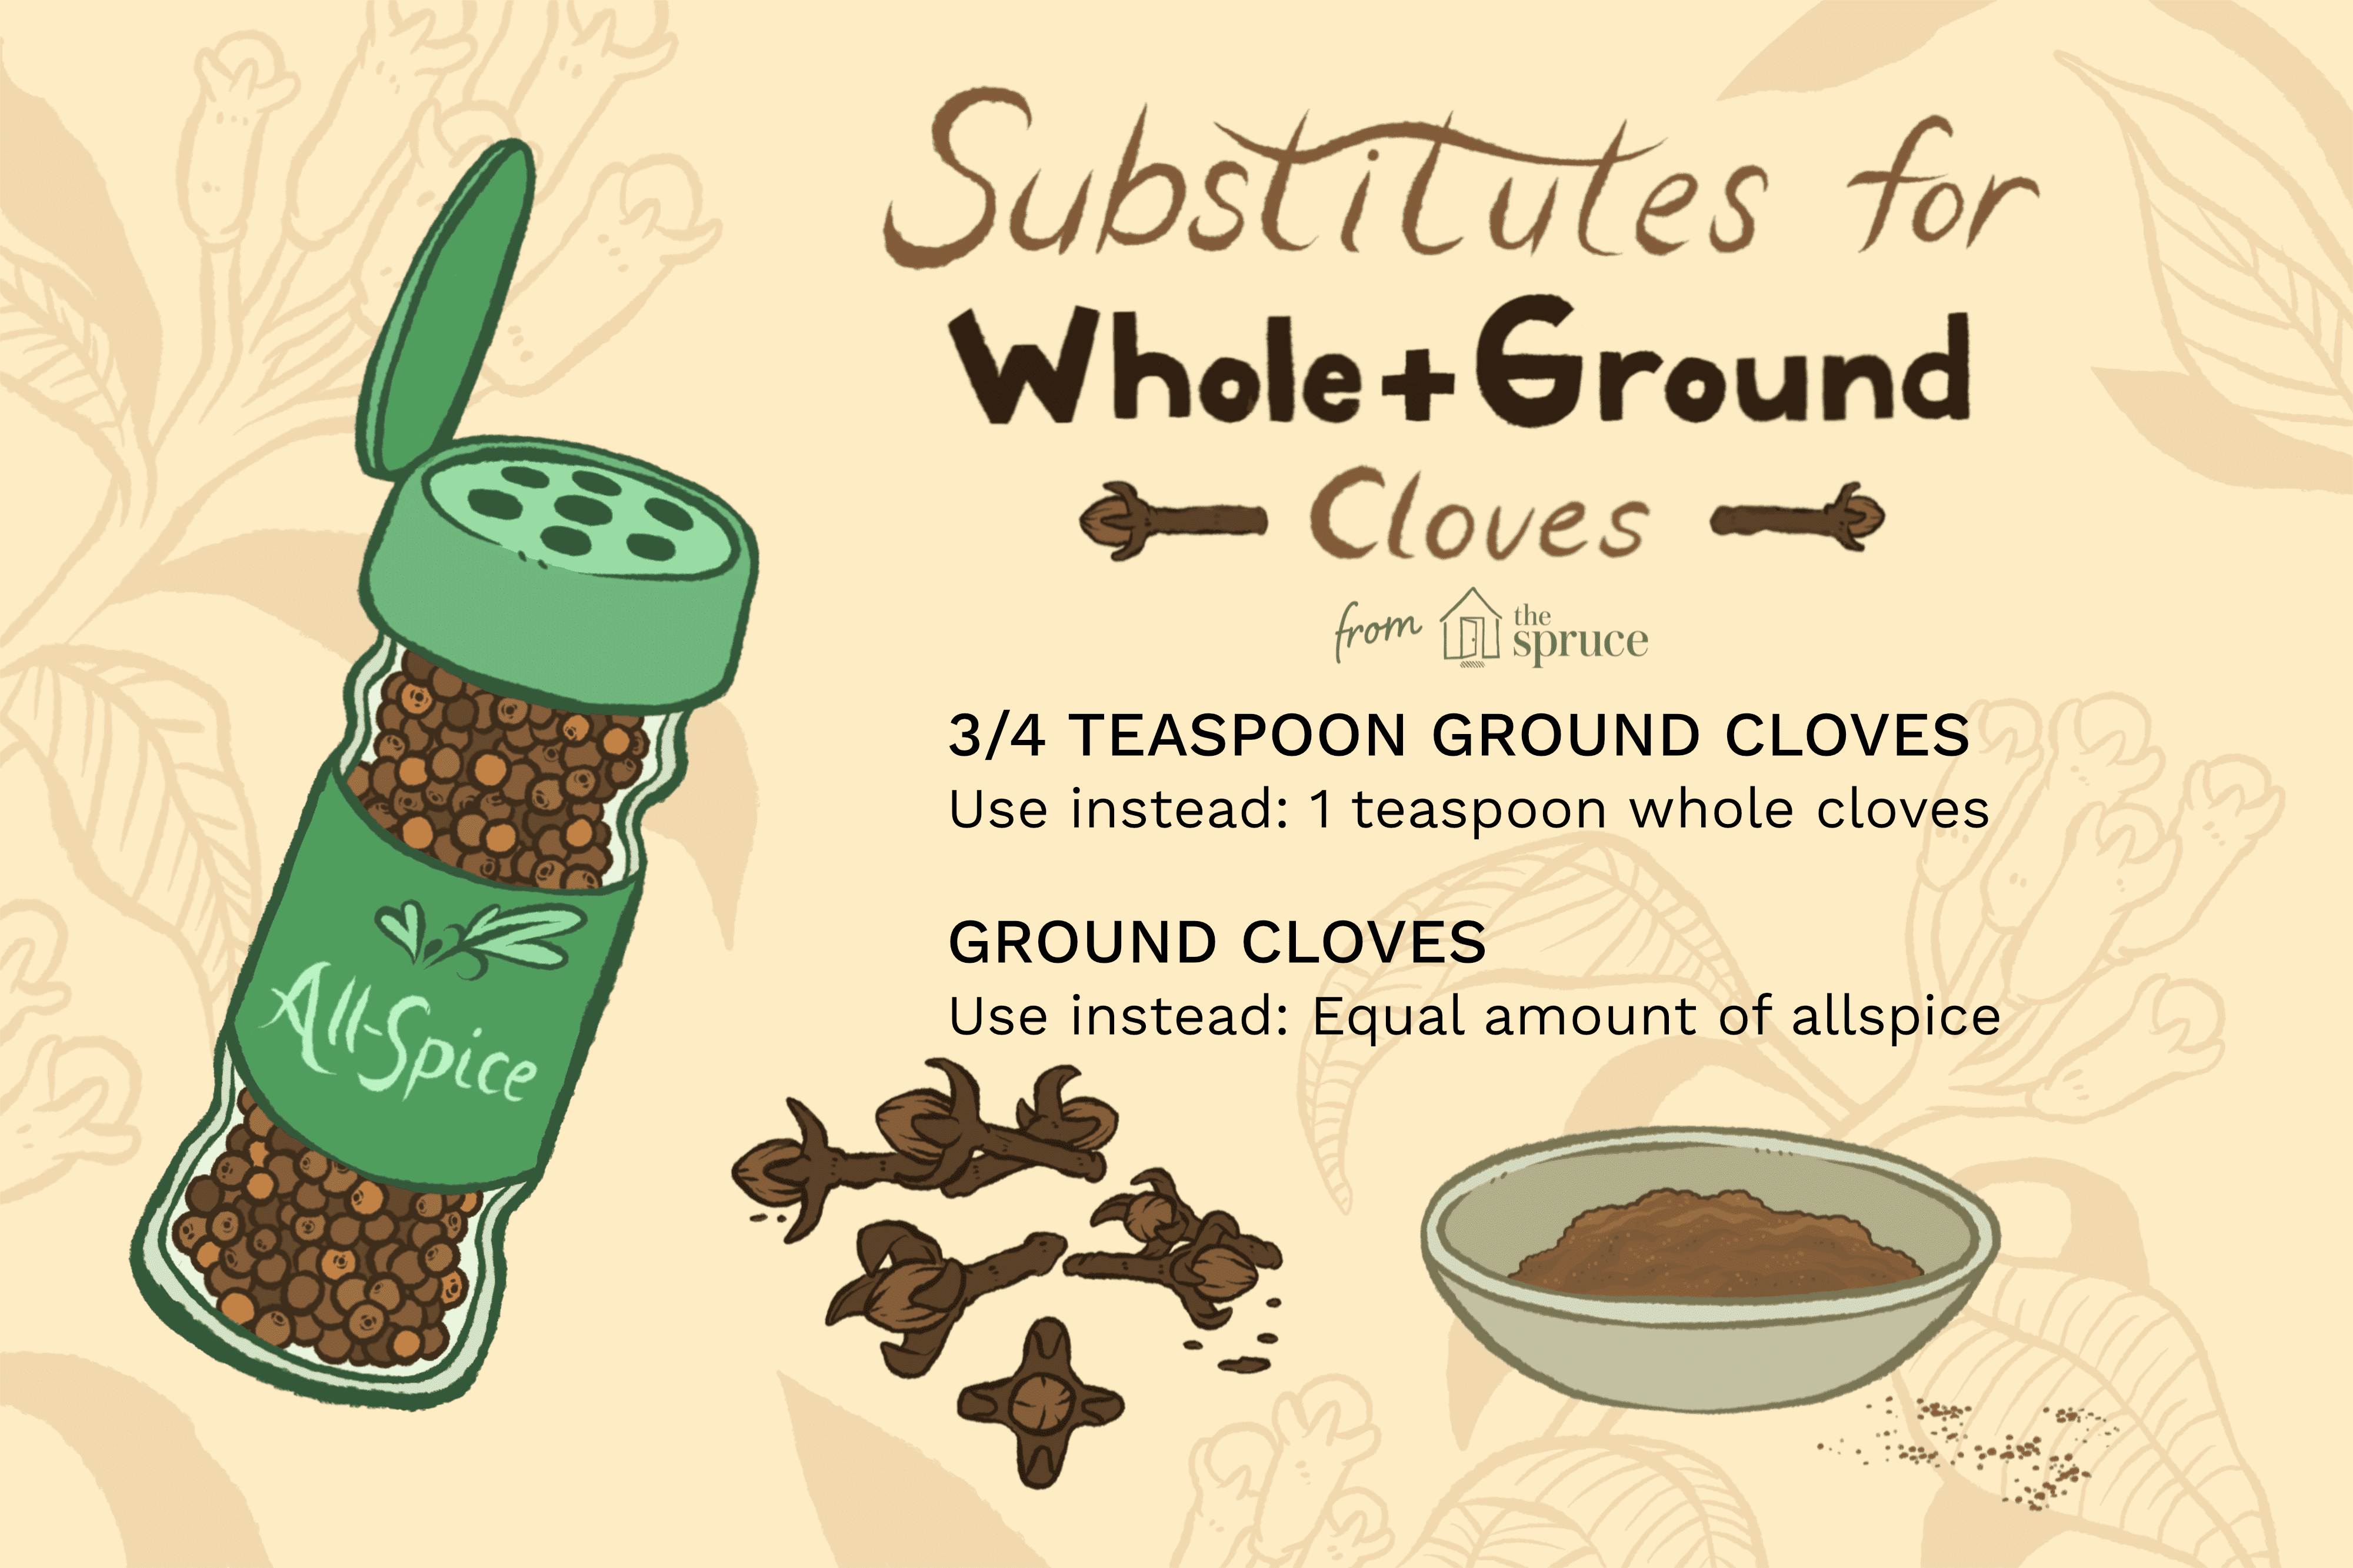 Clove subs